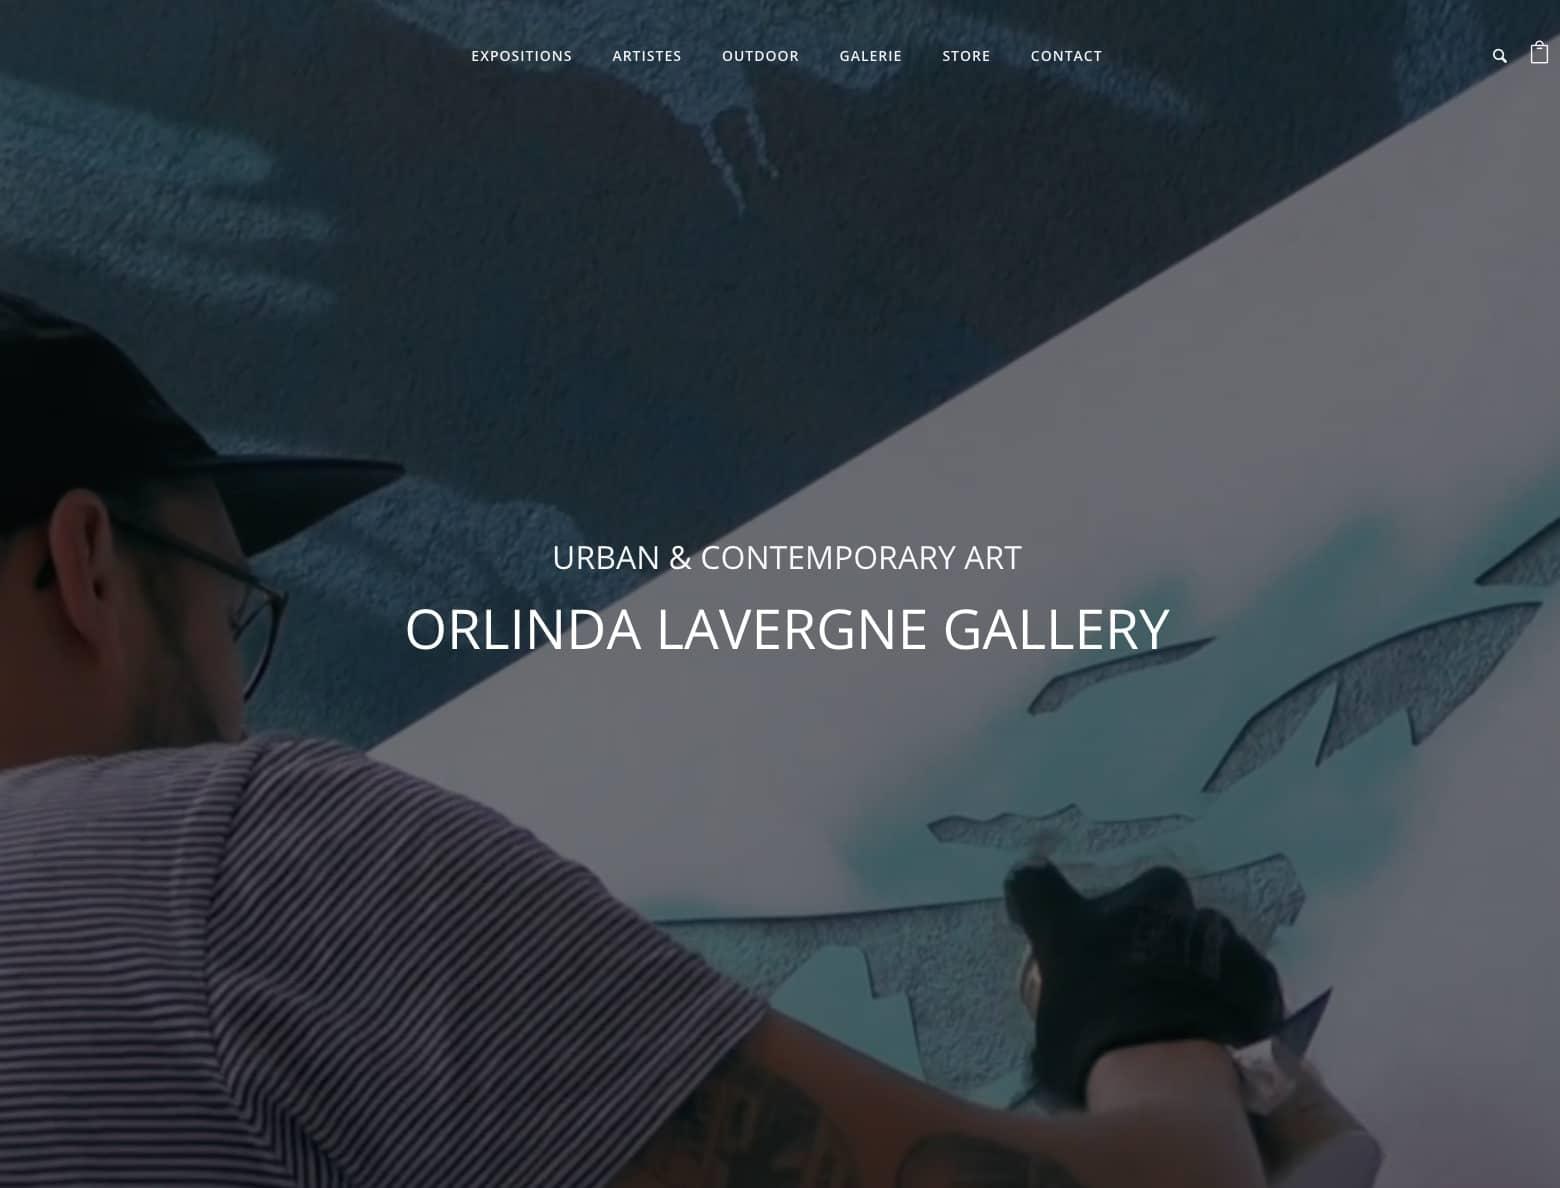 galerie Orlinda Lavergne, cliente de l'agence Karedess Agency spécialiste wordpress